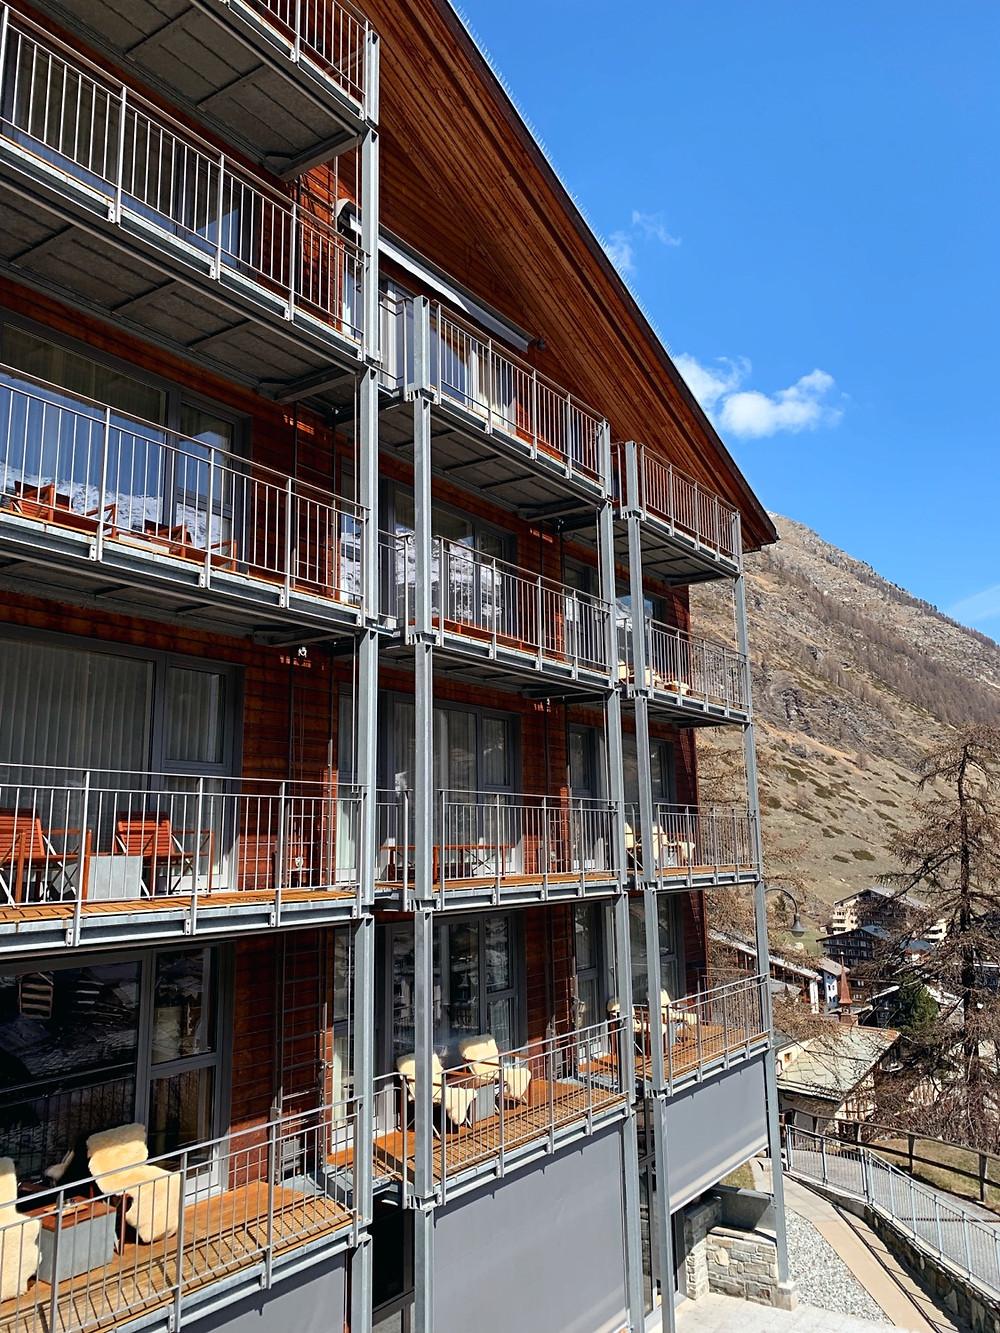 The Omnia | Zermatt Switzerland